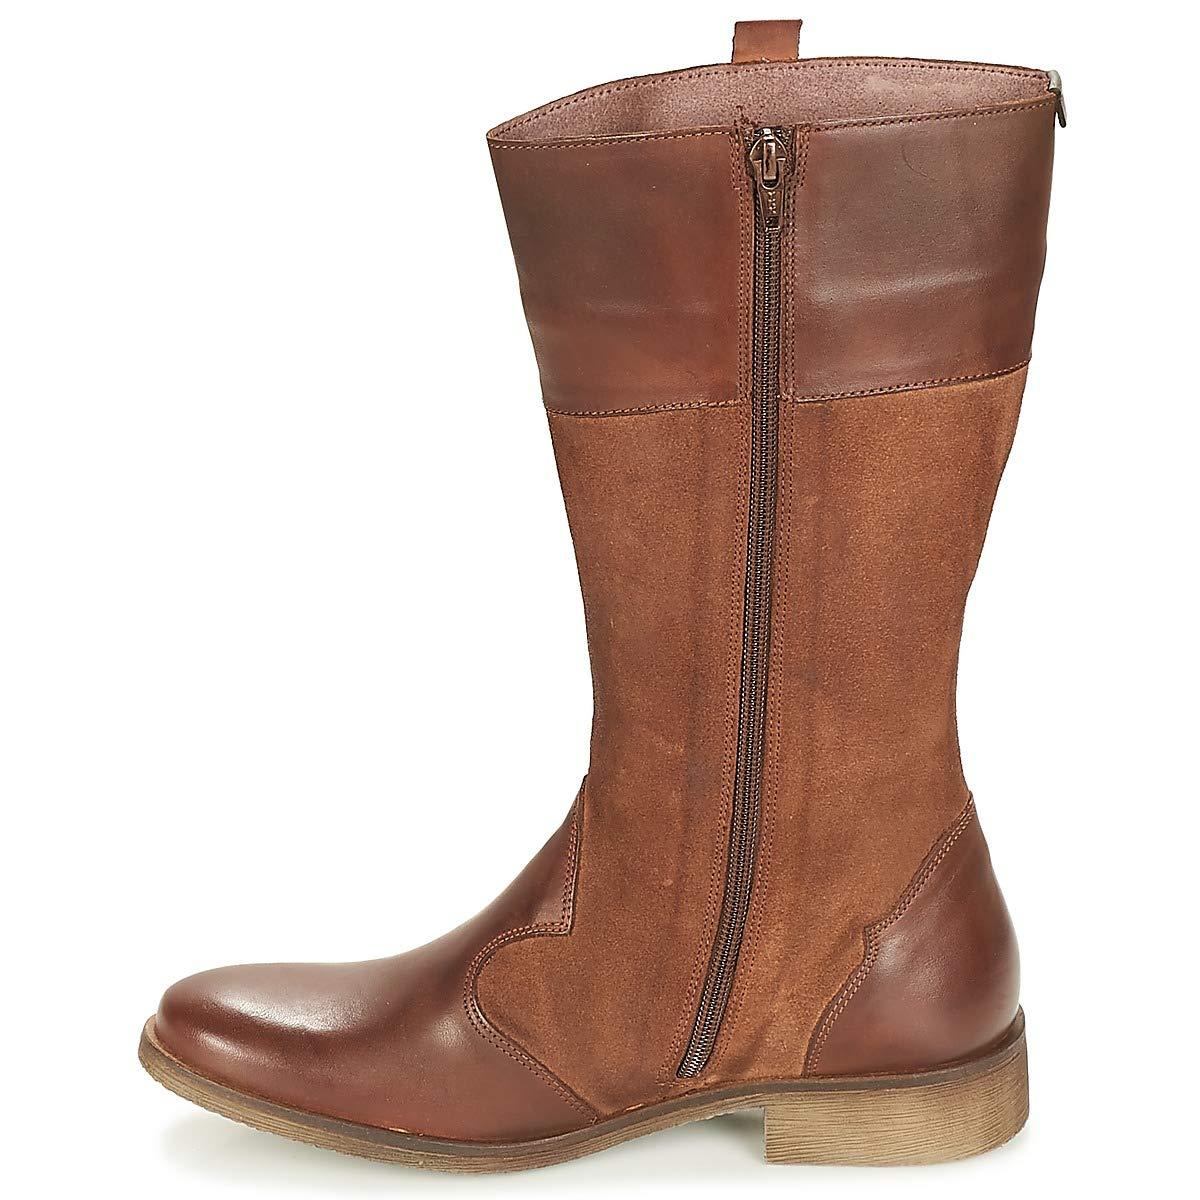 Kickers LADDY Stiefel Camel Damen Camel Stiefel Klassische Stiefel 027b93